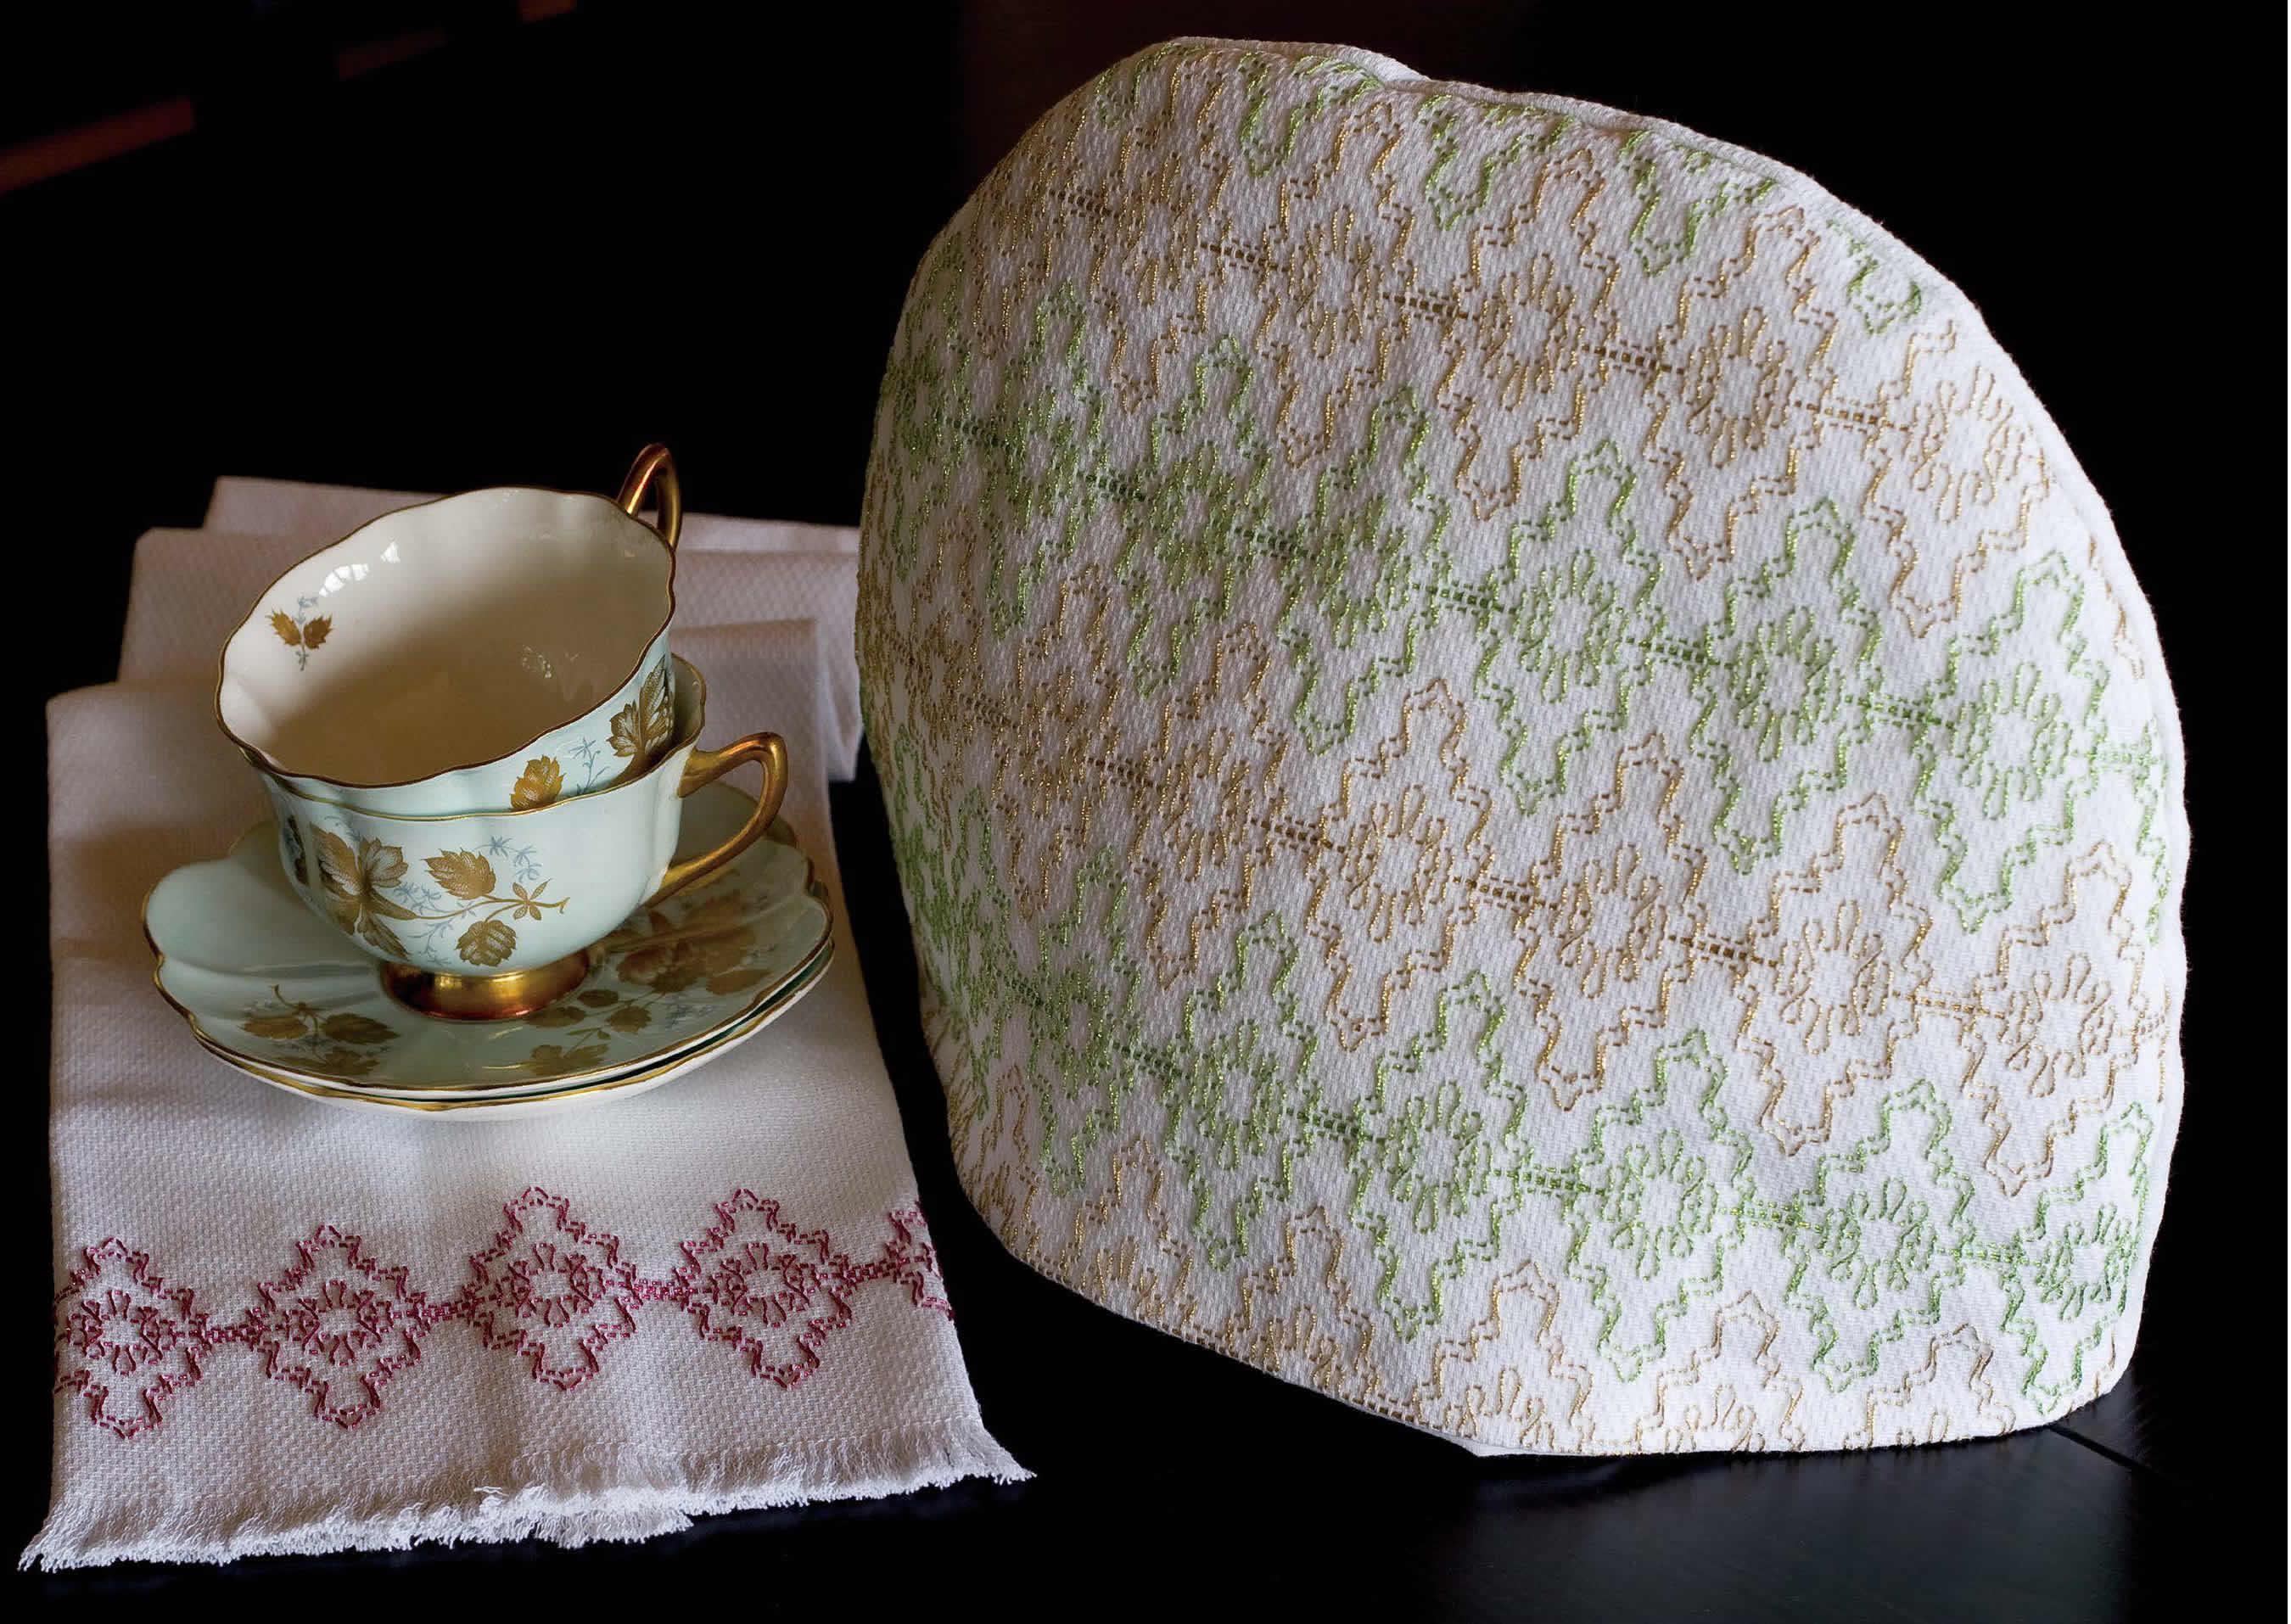 Victorian Christmas Lace Tea Cozy & Tea Towel Set Pattern - Festive 2011